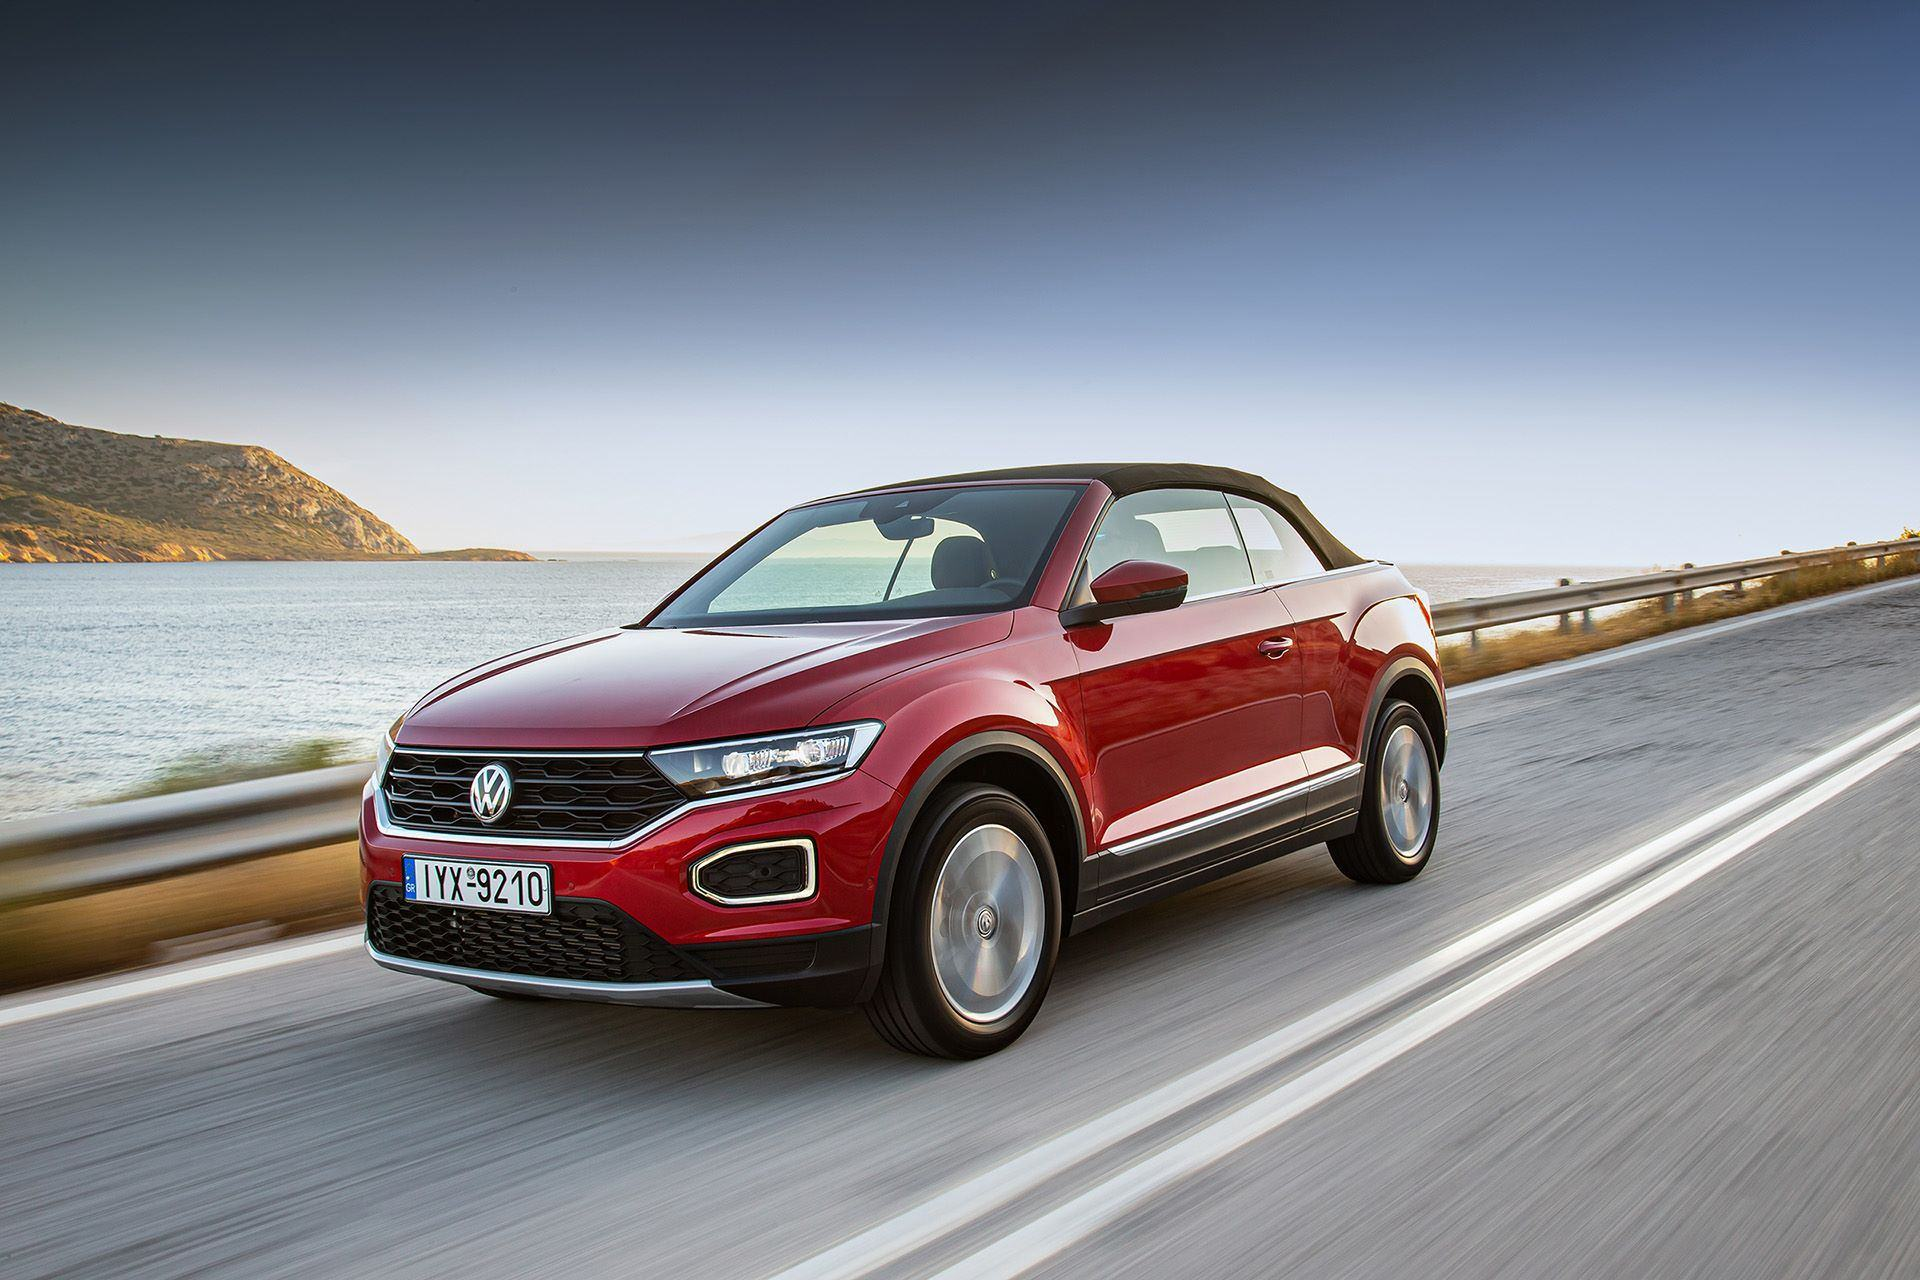 Volkswagen-T-Roc-Cabriolet-Greece-42